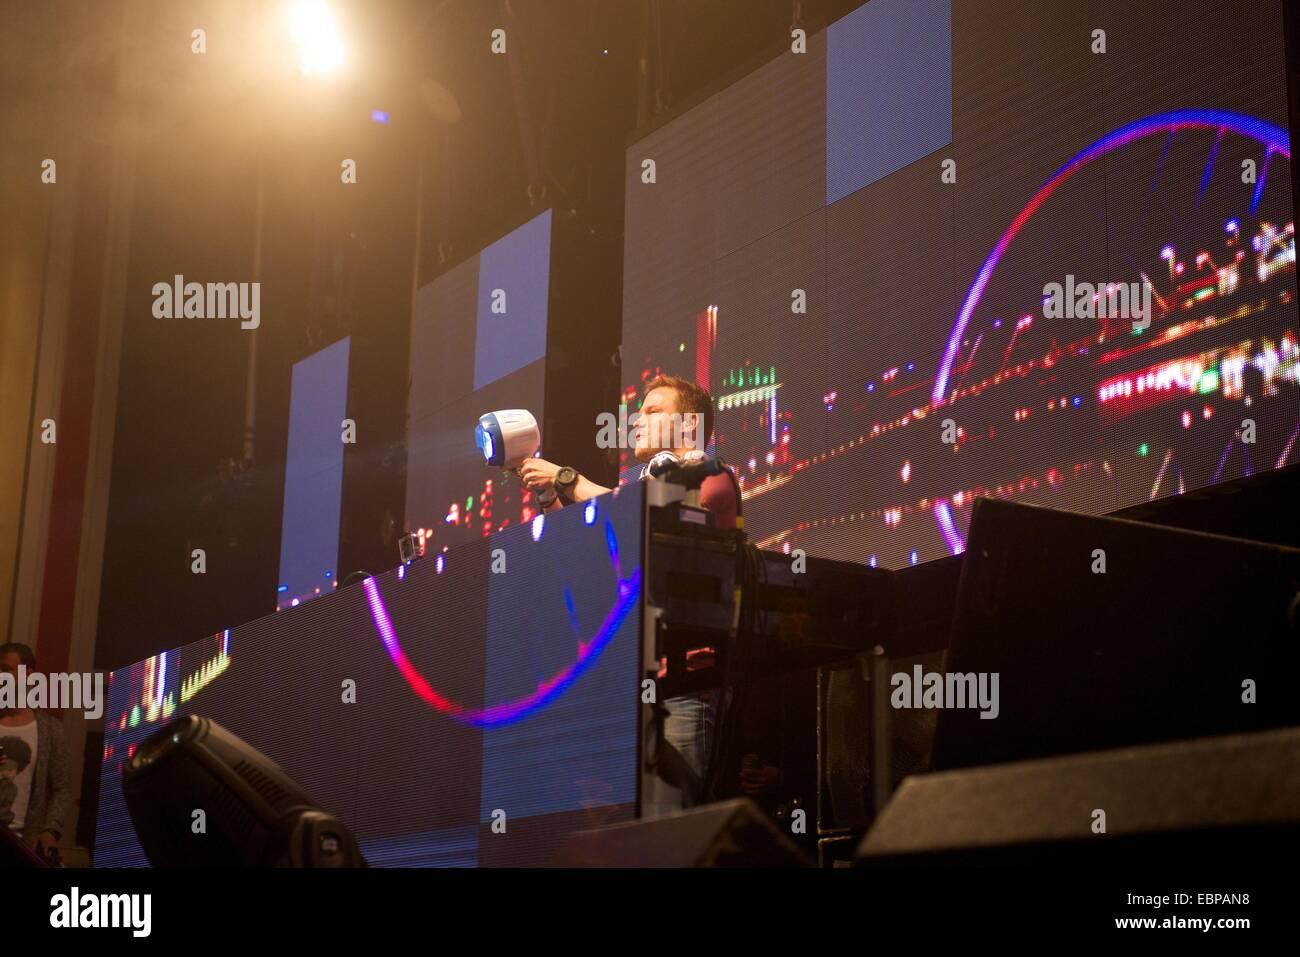 Dutch DJ Dash Berlin performing at O2 Academy in Glasgow - Stock Image